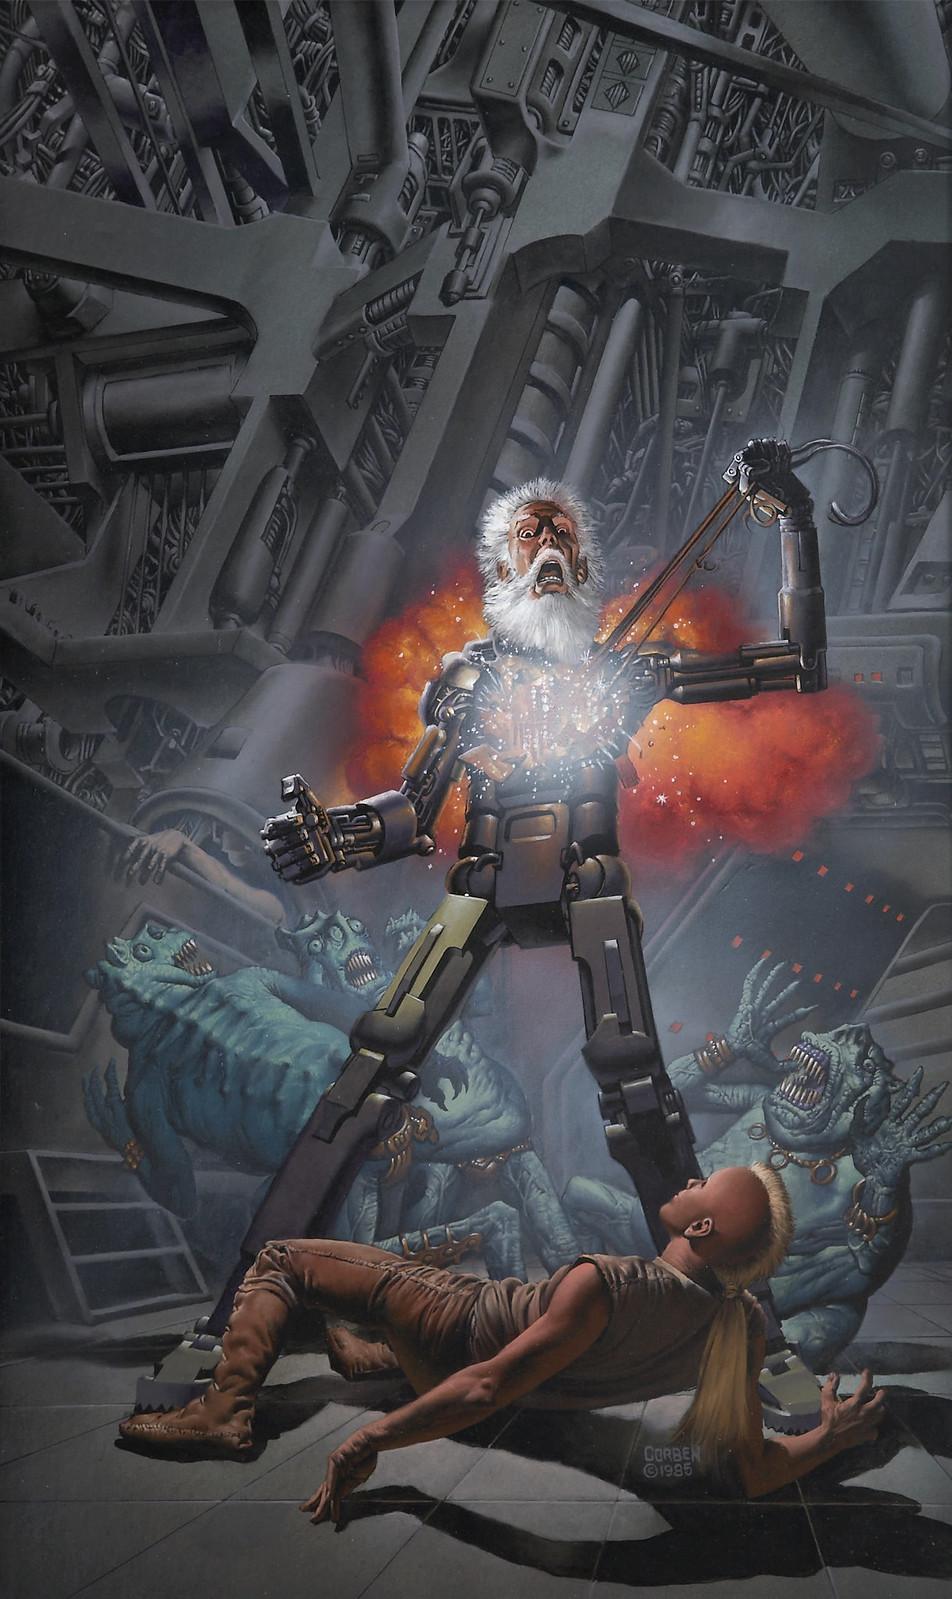 Richard Corben - Warchild, paperback cover, 1986